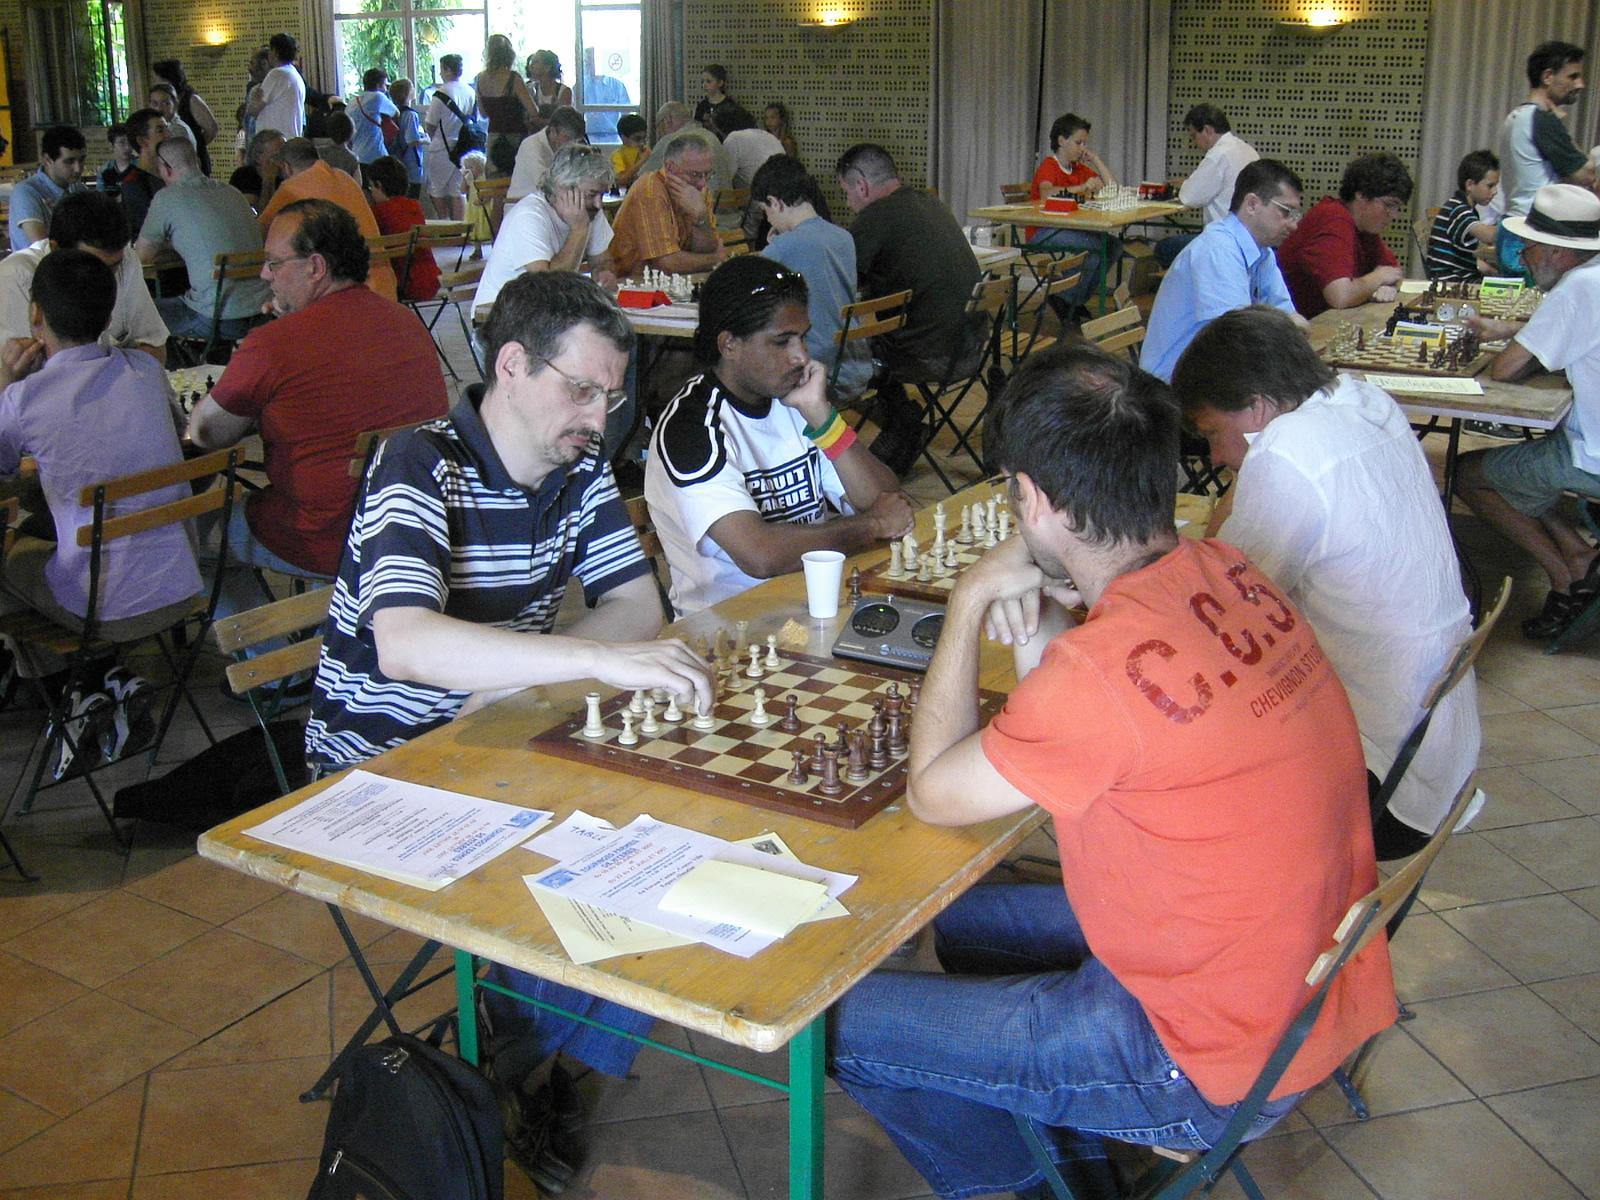 Grand Prix Arcois 2007 (54) Laurent Milesi vs Karoly Olah